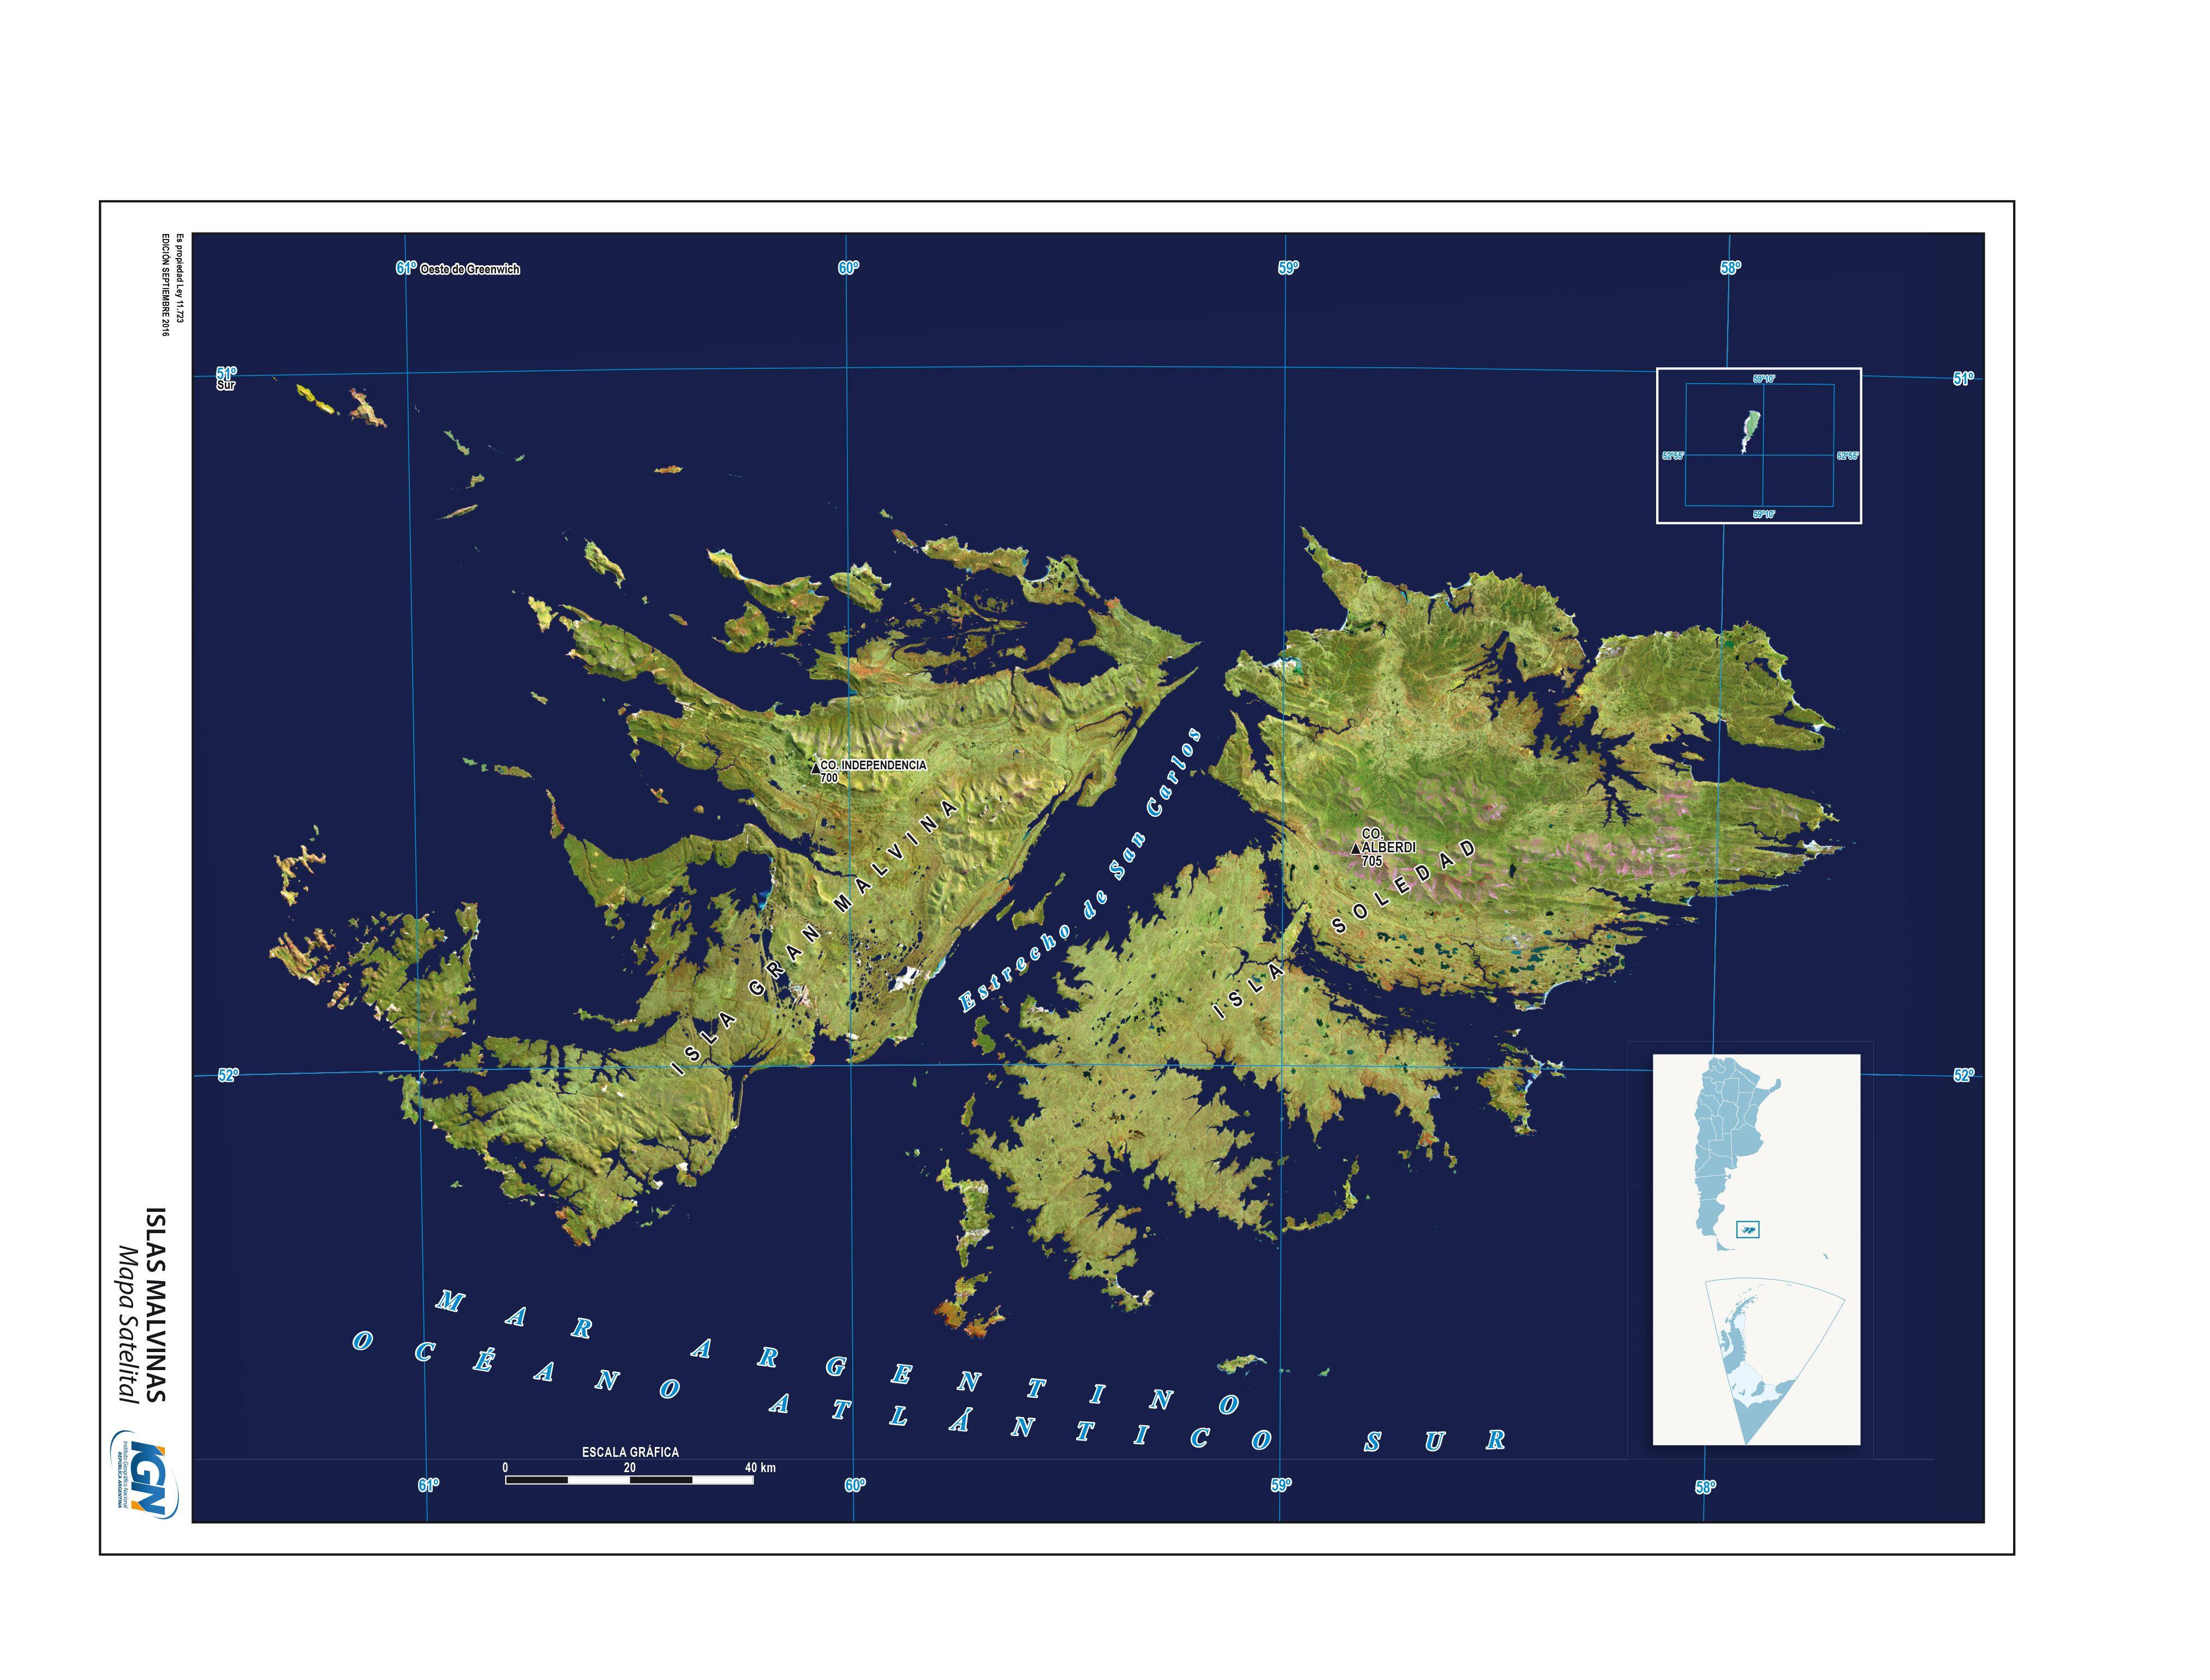 Mapa Satelital De Las Islas Malvinas Instituto Geografico Nacional De La Republica Argentina Mapa De Fantasia Mapa Escolar Mapas